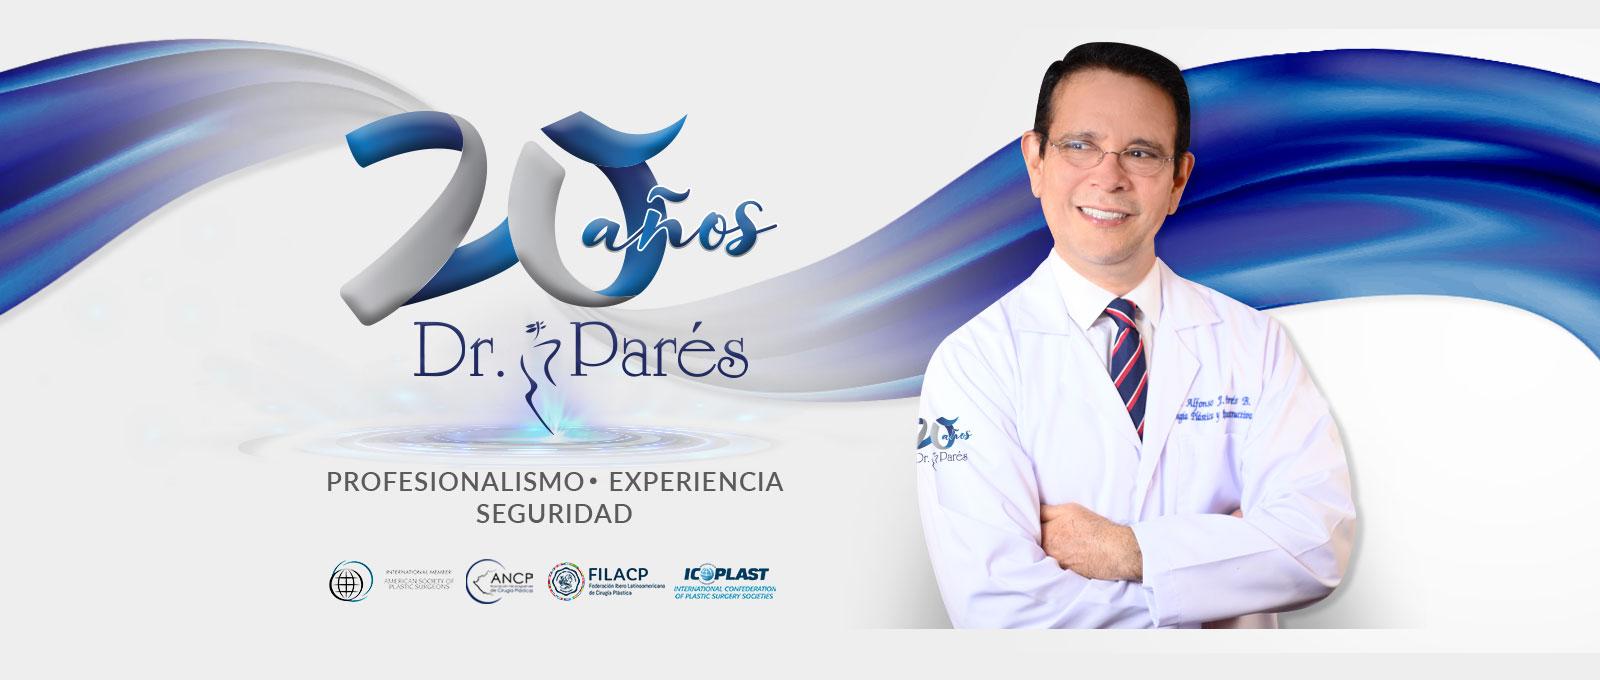 20 años Dr. Parés